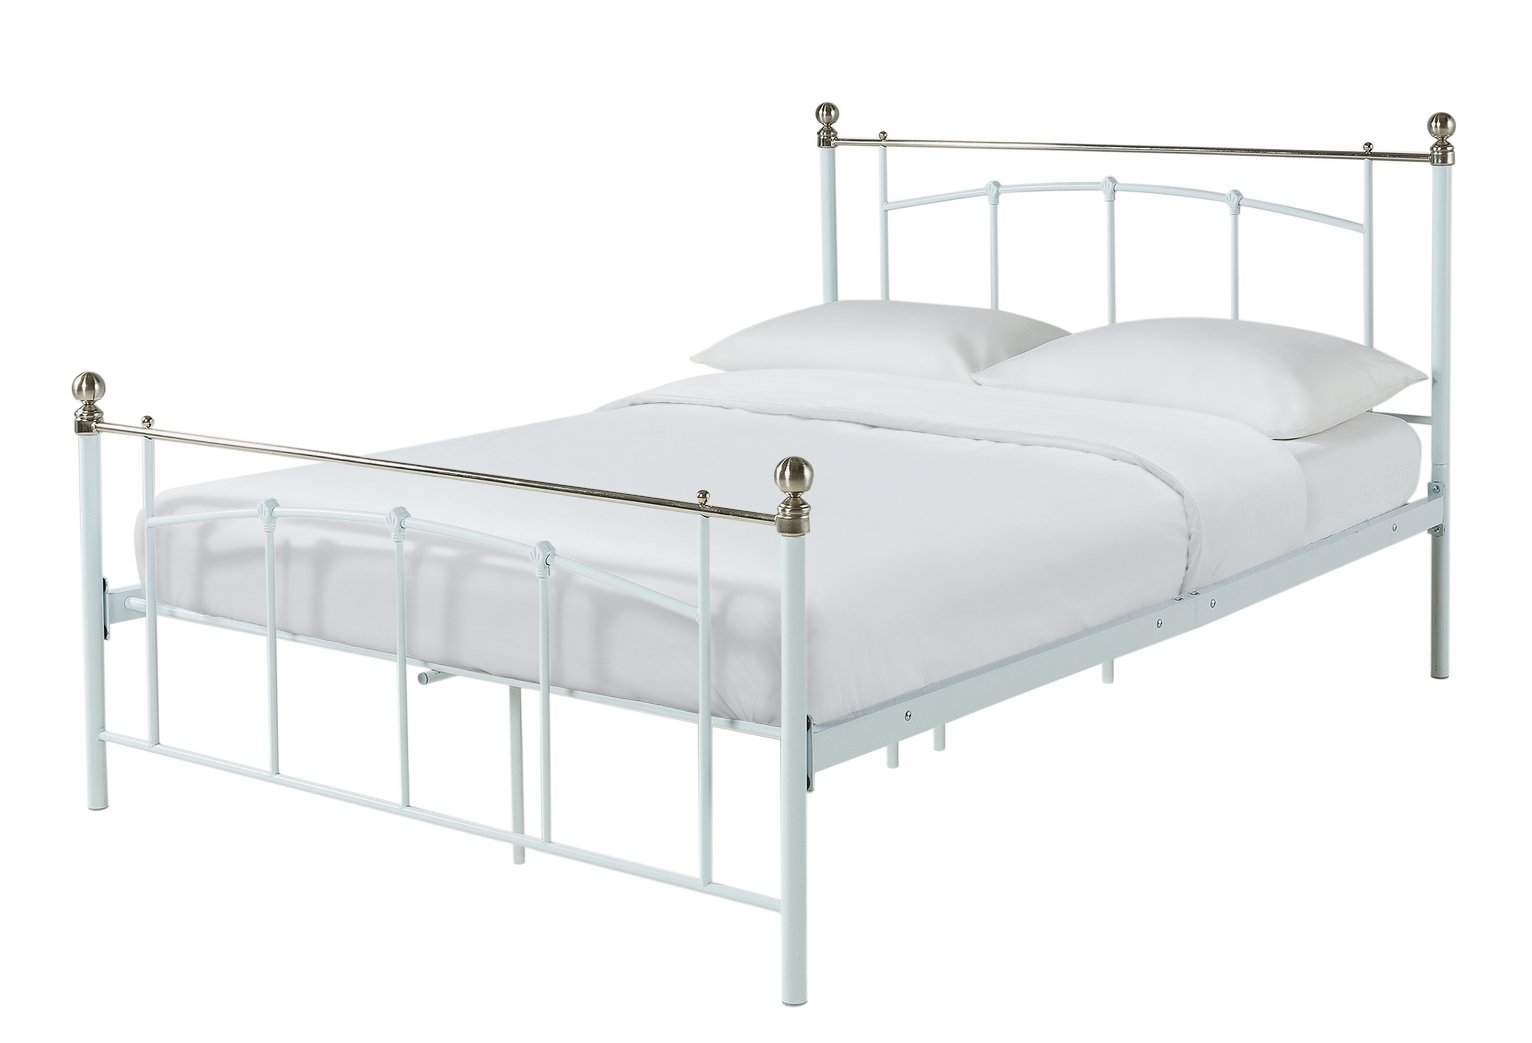 Argos Home Yani Double Bed Frame - White